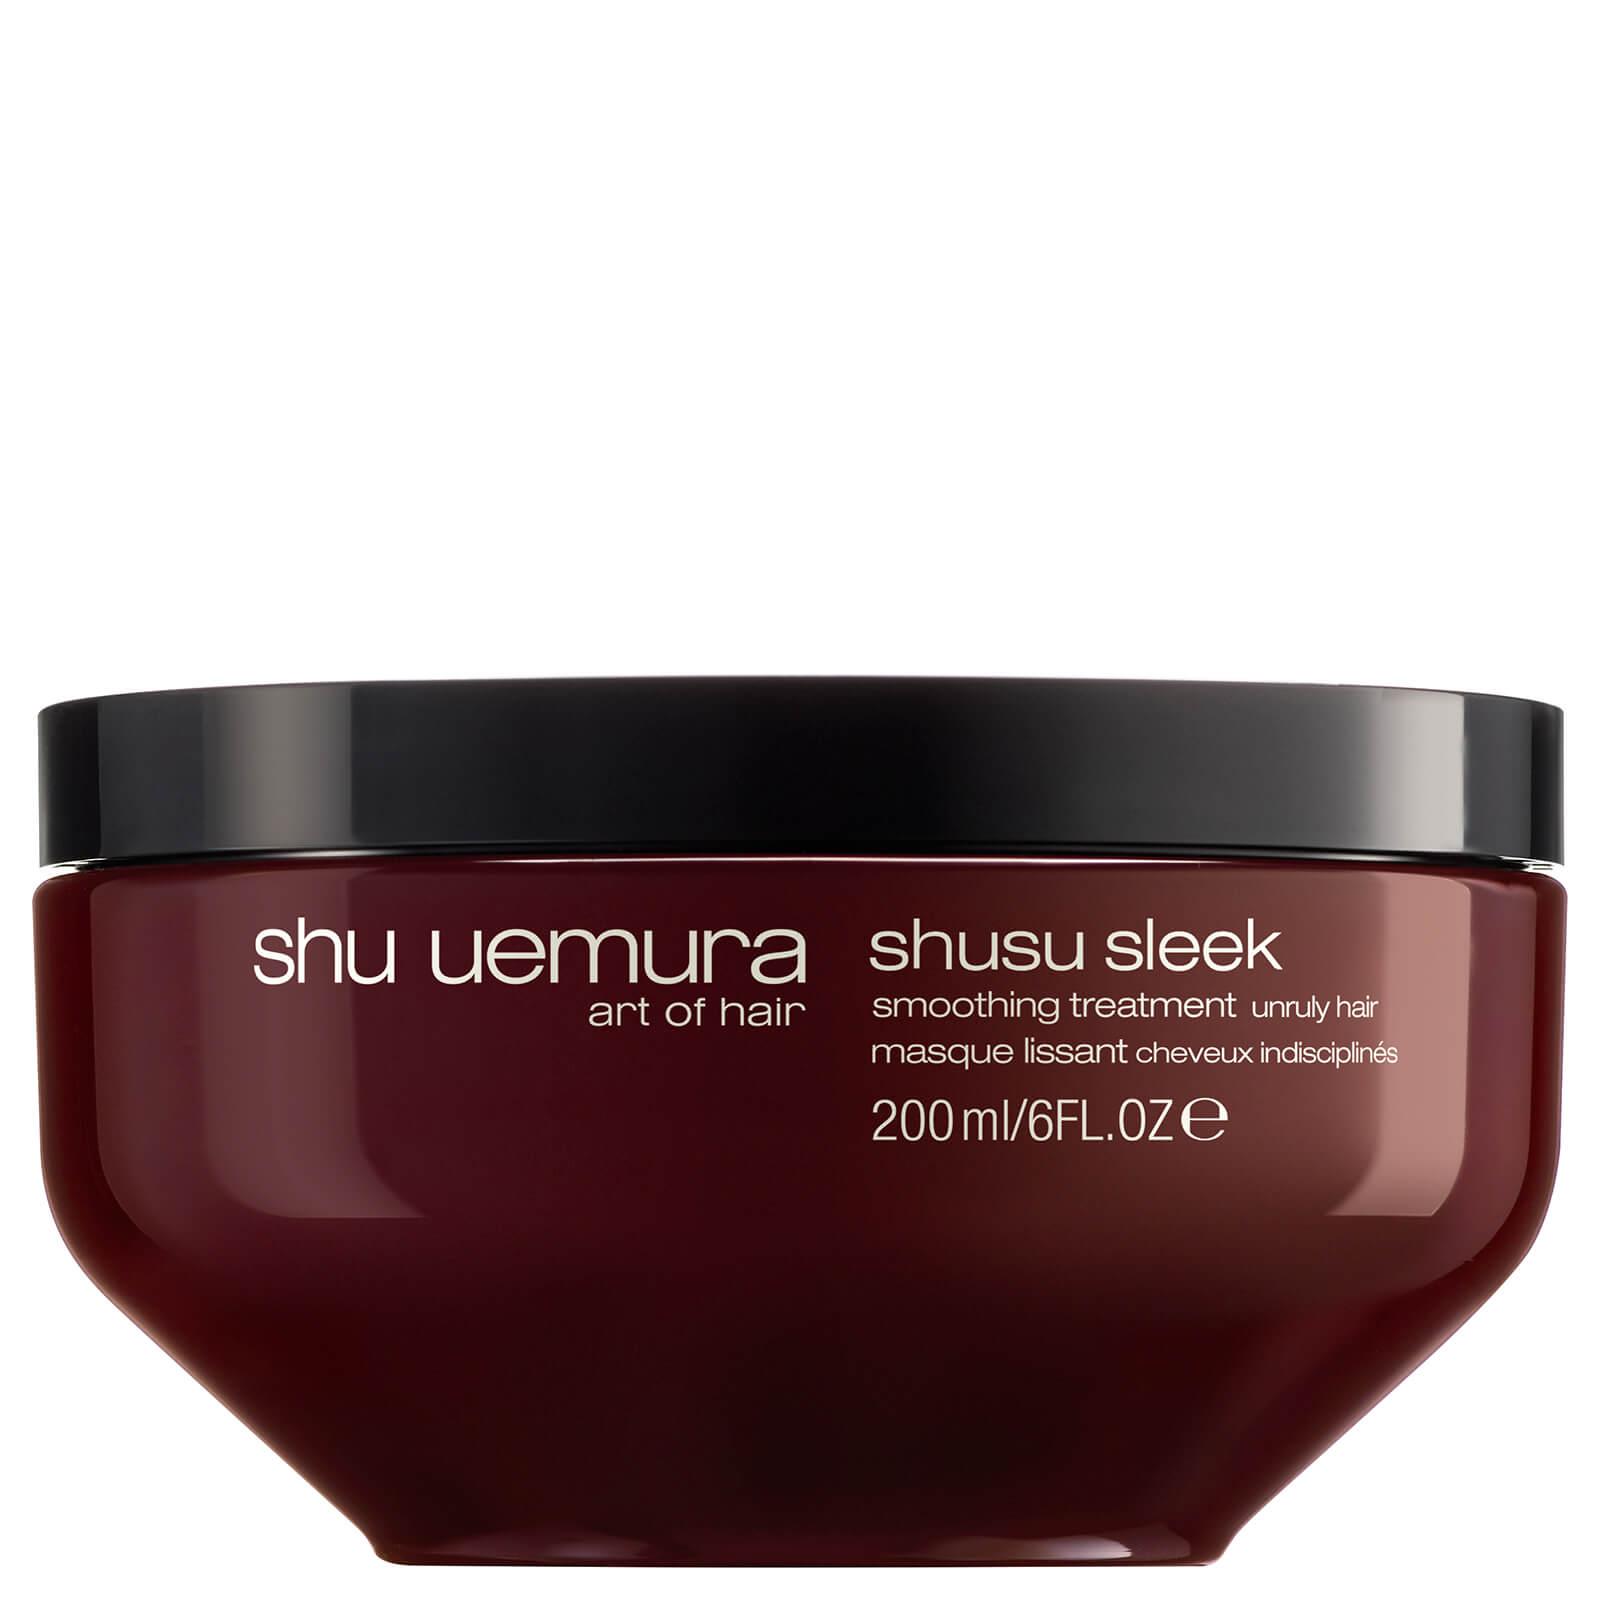 Shu Uemura Art Of Hair Shusu Sleek Masque lissant pour cheveux rebelles (200ml)